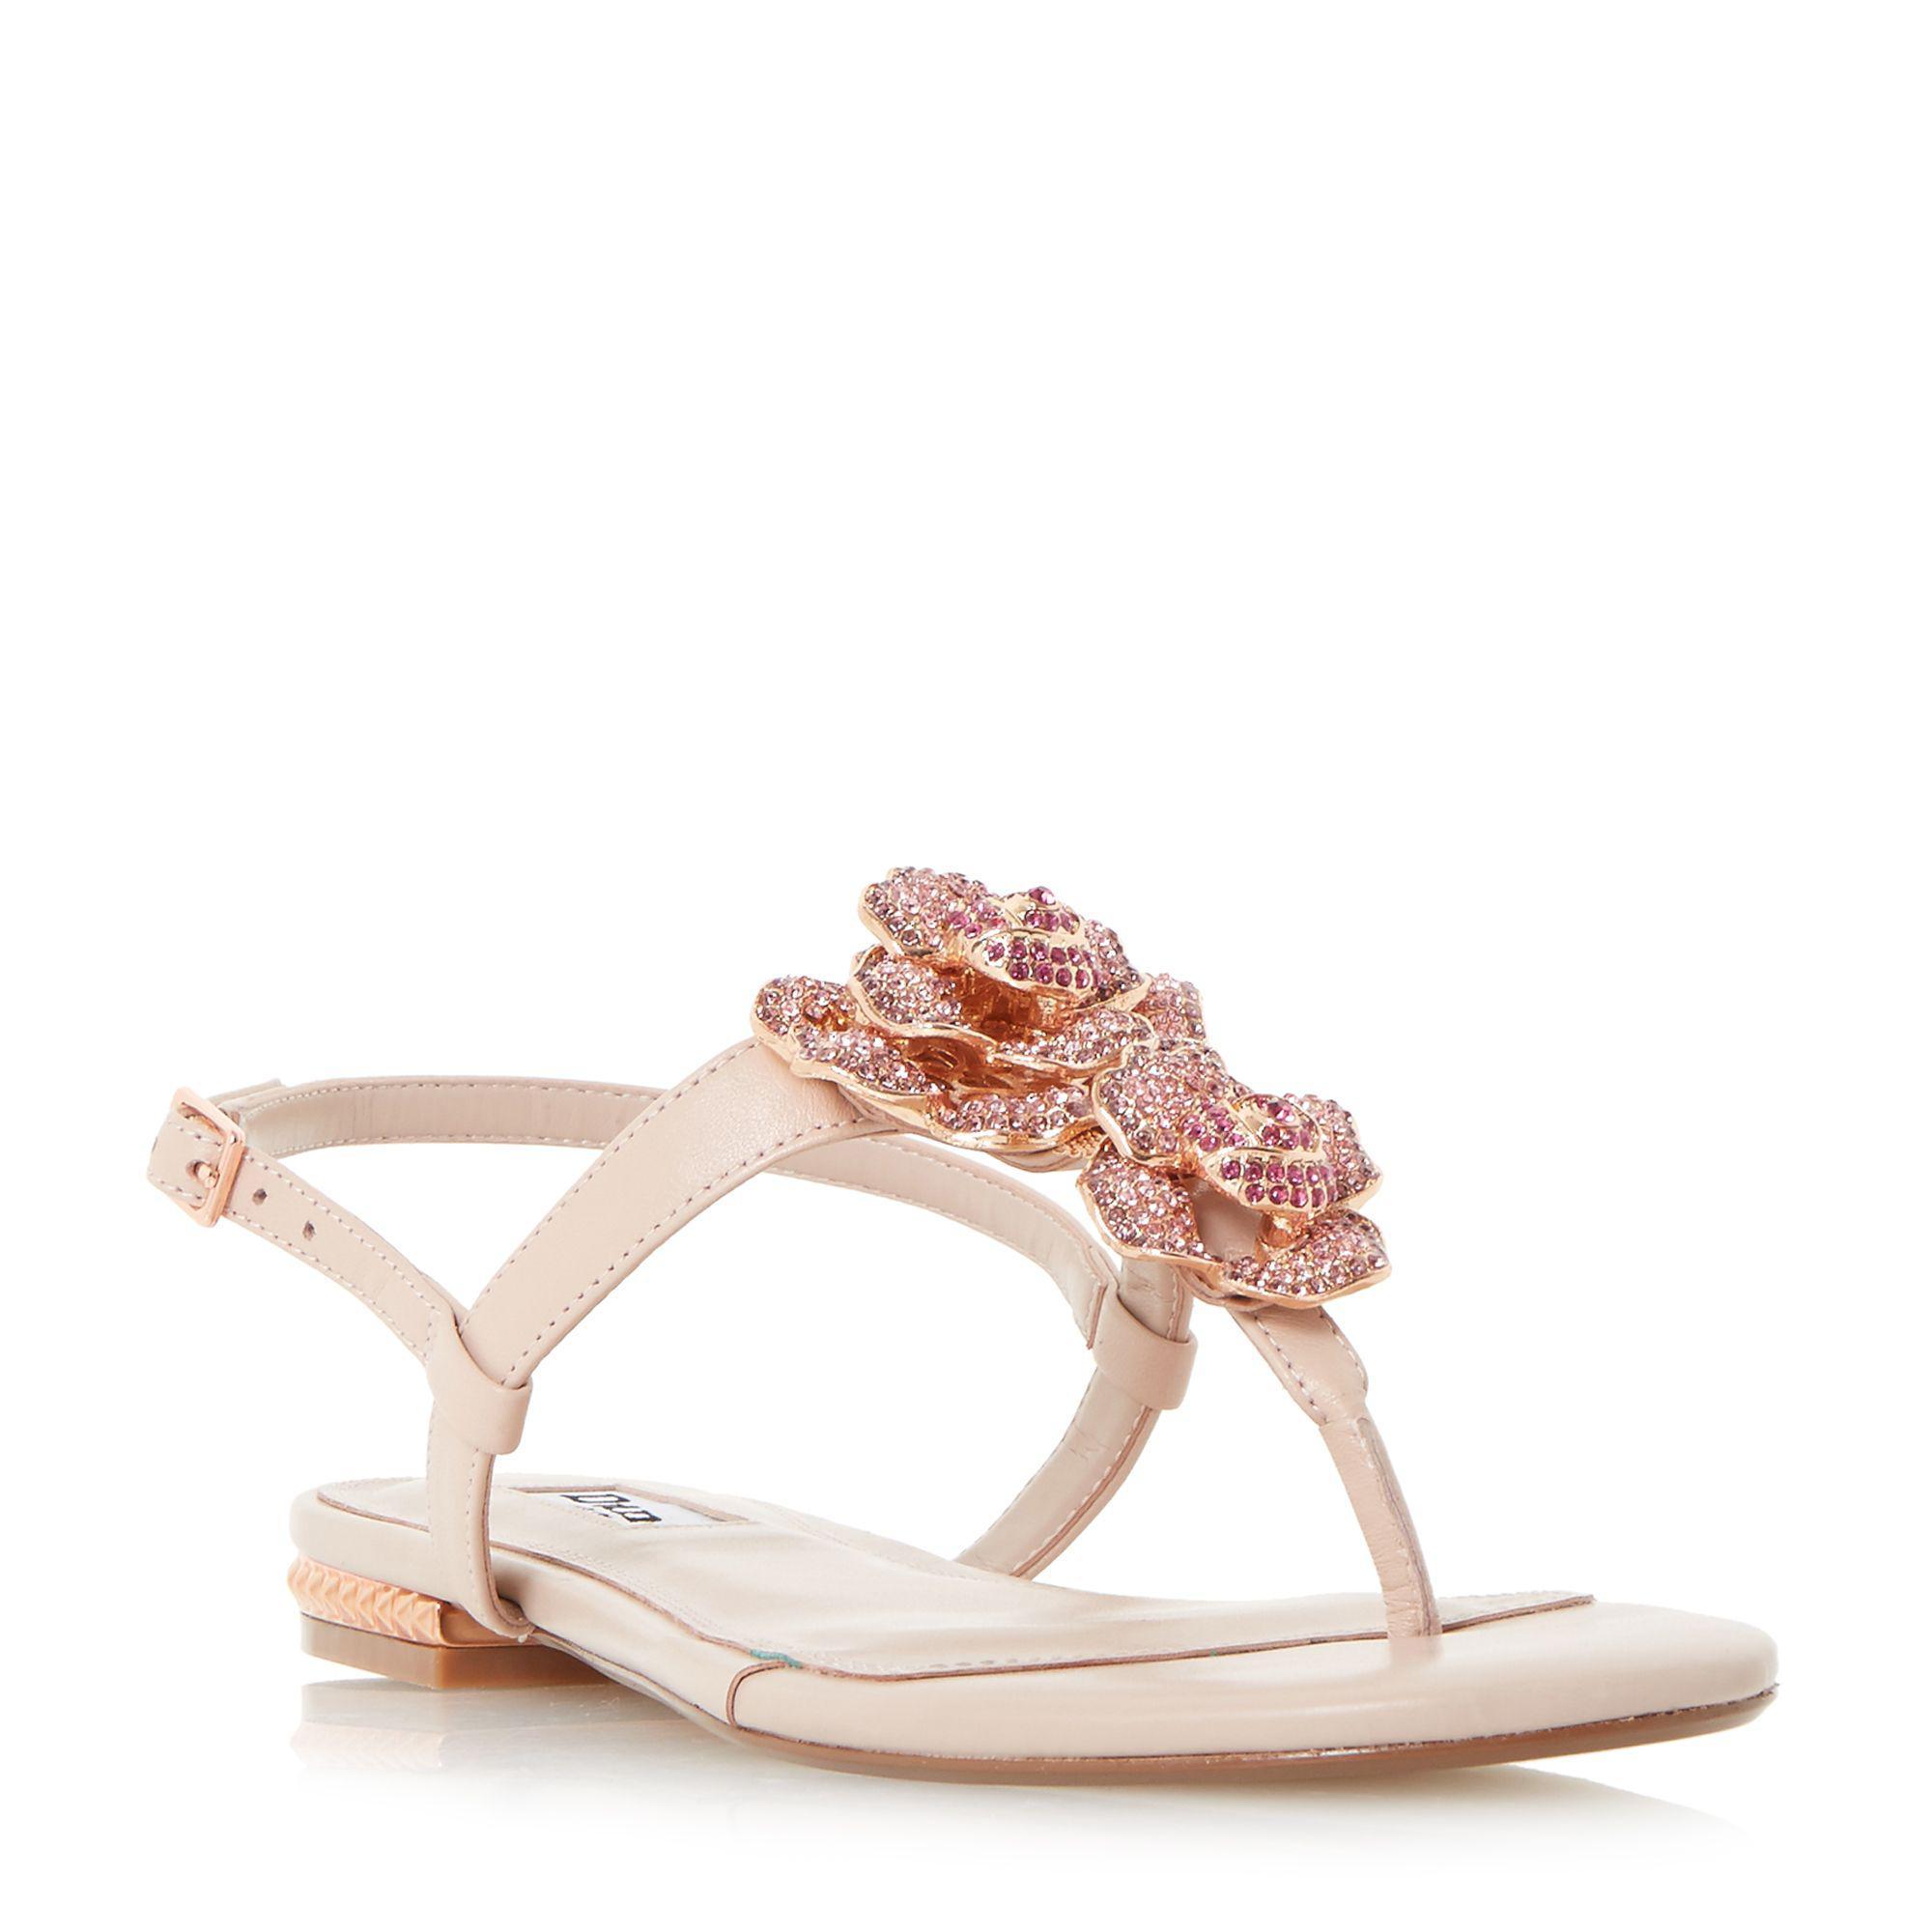 7f12d80268ca1 Dune Light Pink  mulligan  Jewel Floral Brooch Sandals in Pink ...